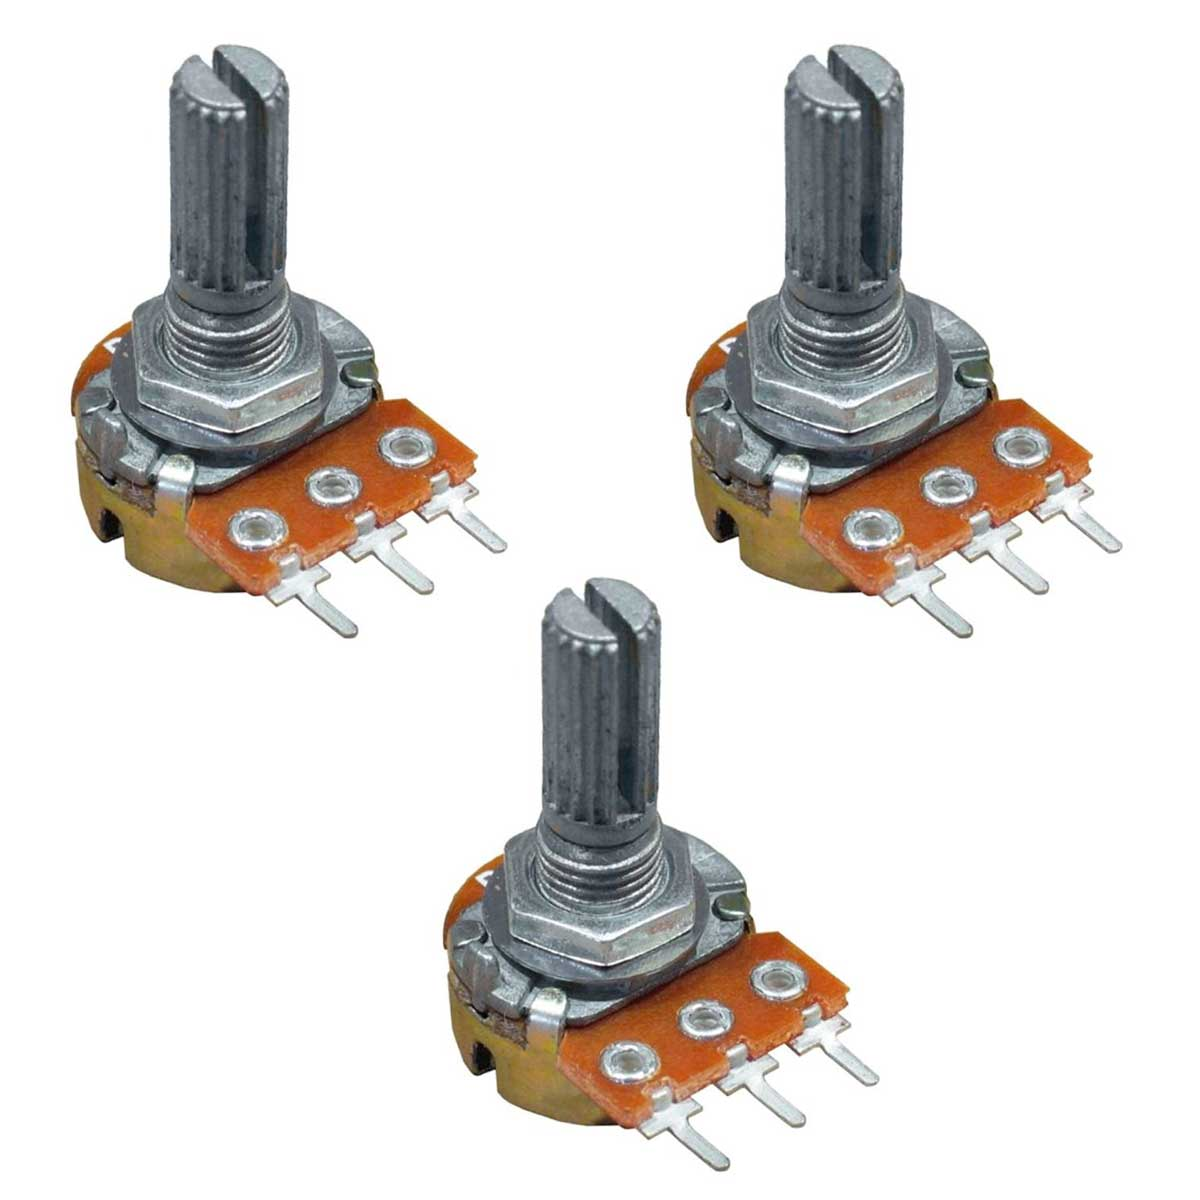 3x Potenciômetro 5K WH148-1-L20 3 Terminais